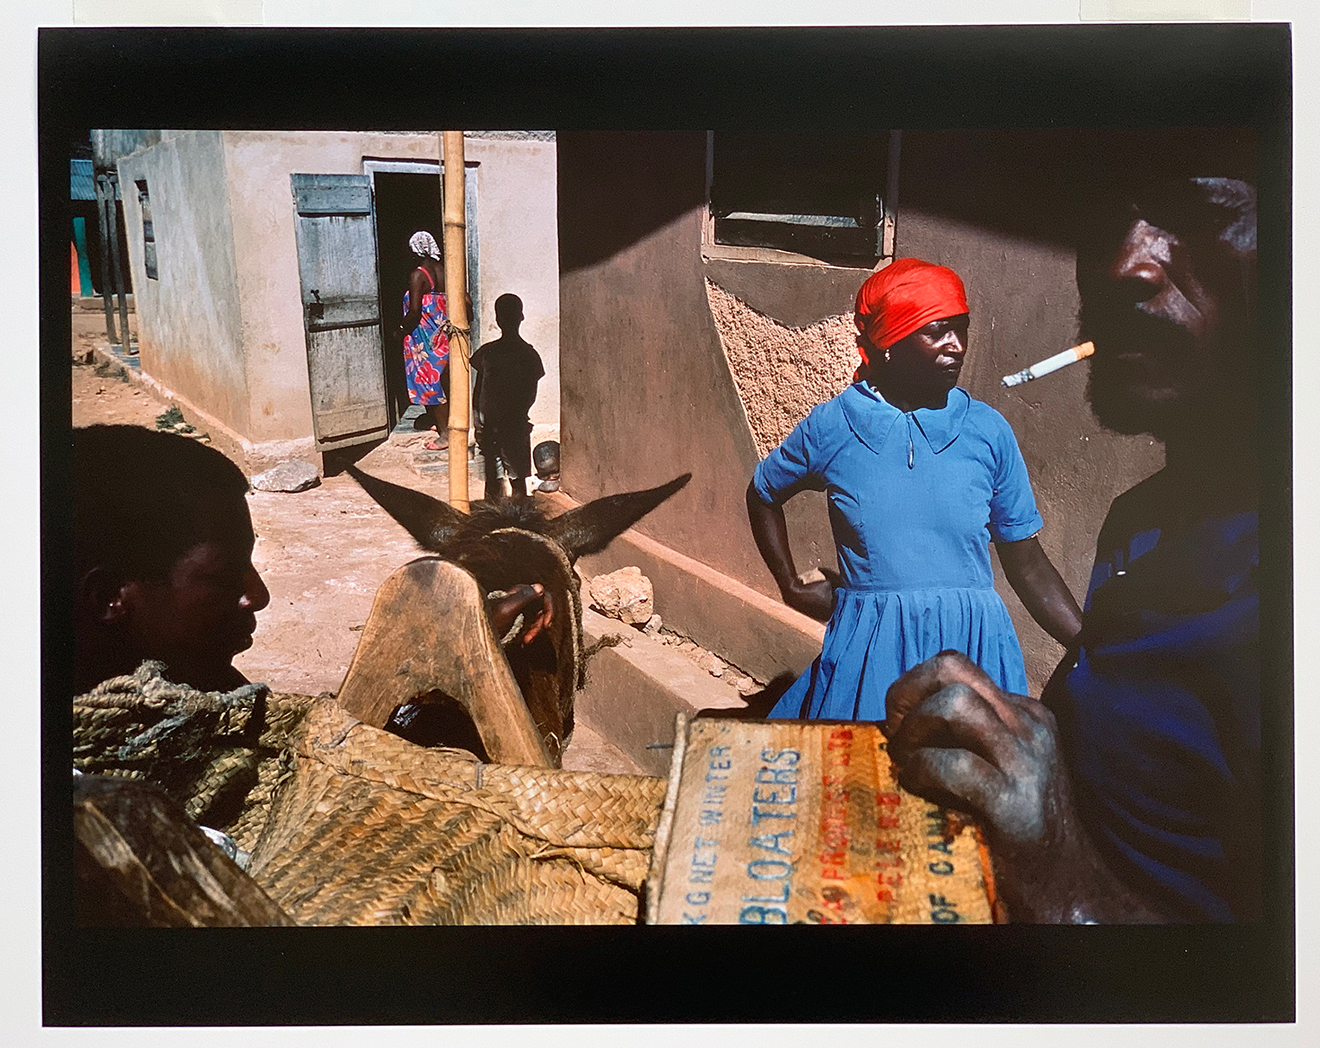 Bombardopolis Haiti artwork by Alex Webb - art listed for sale on Artplode